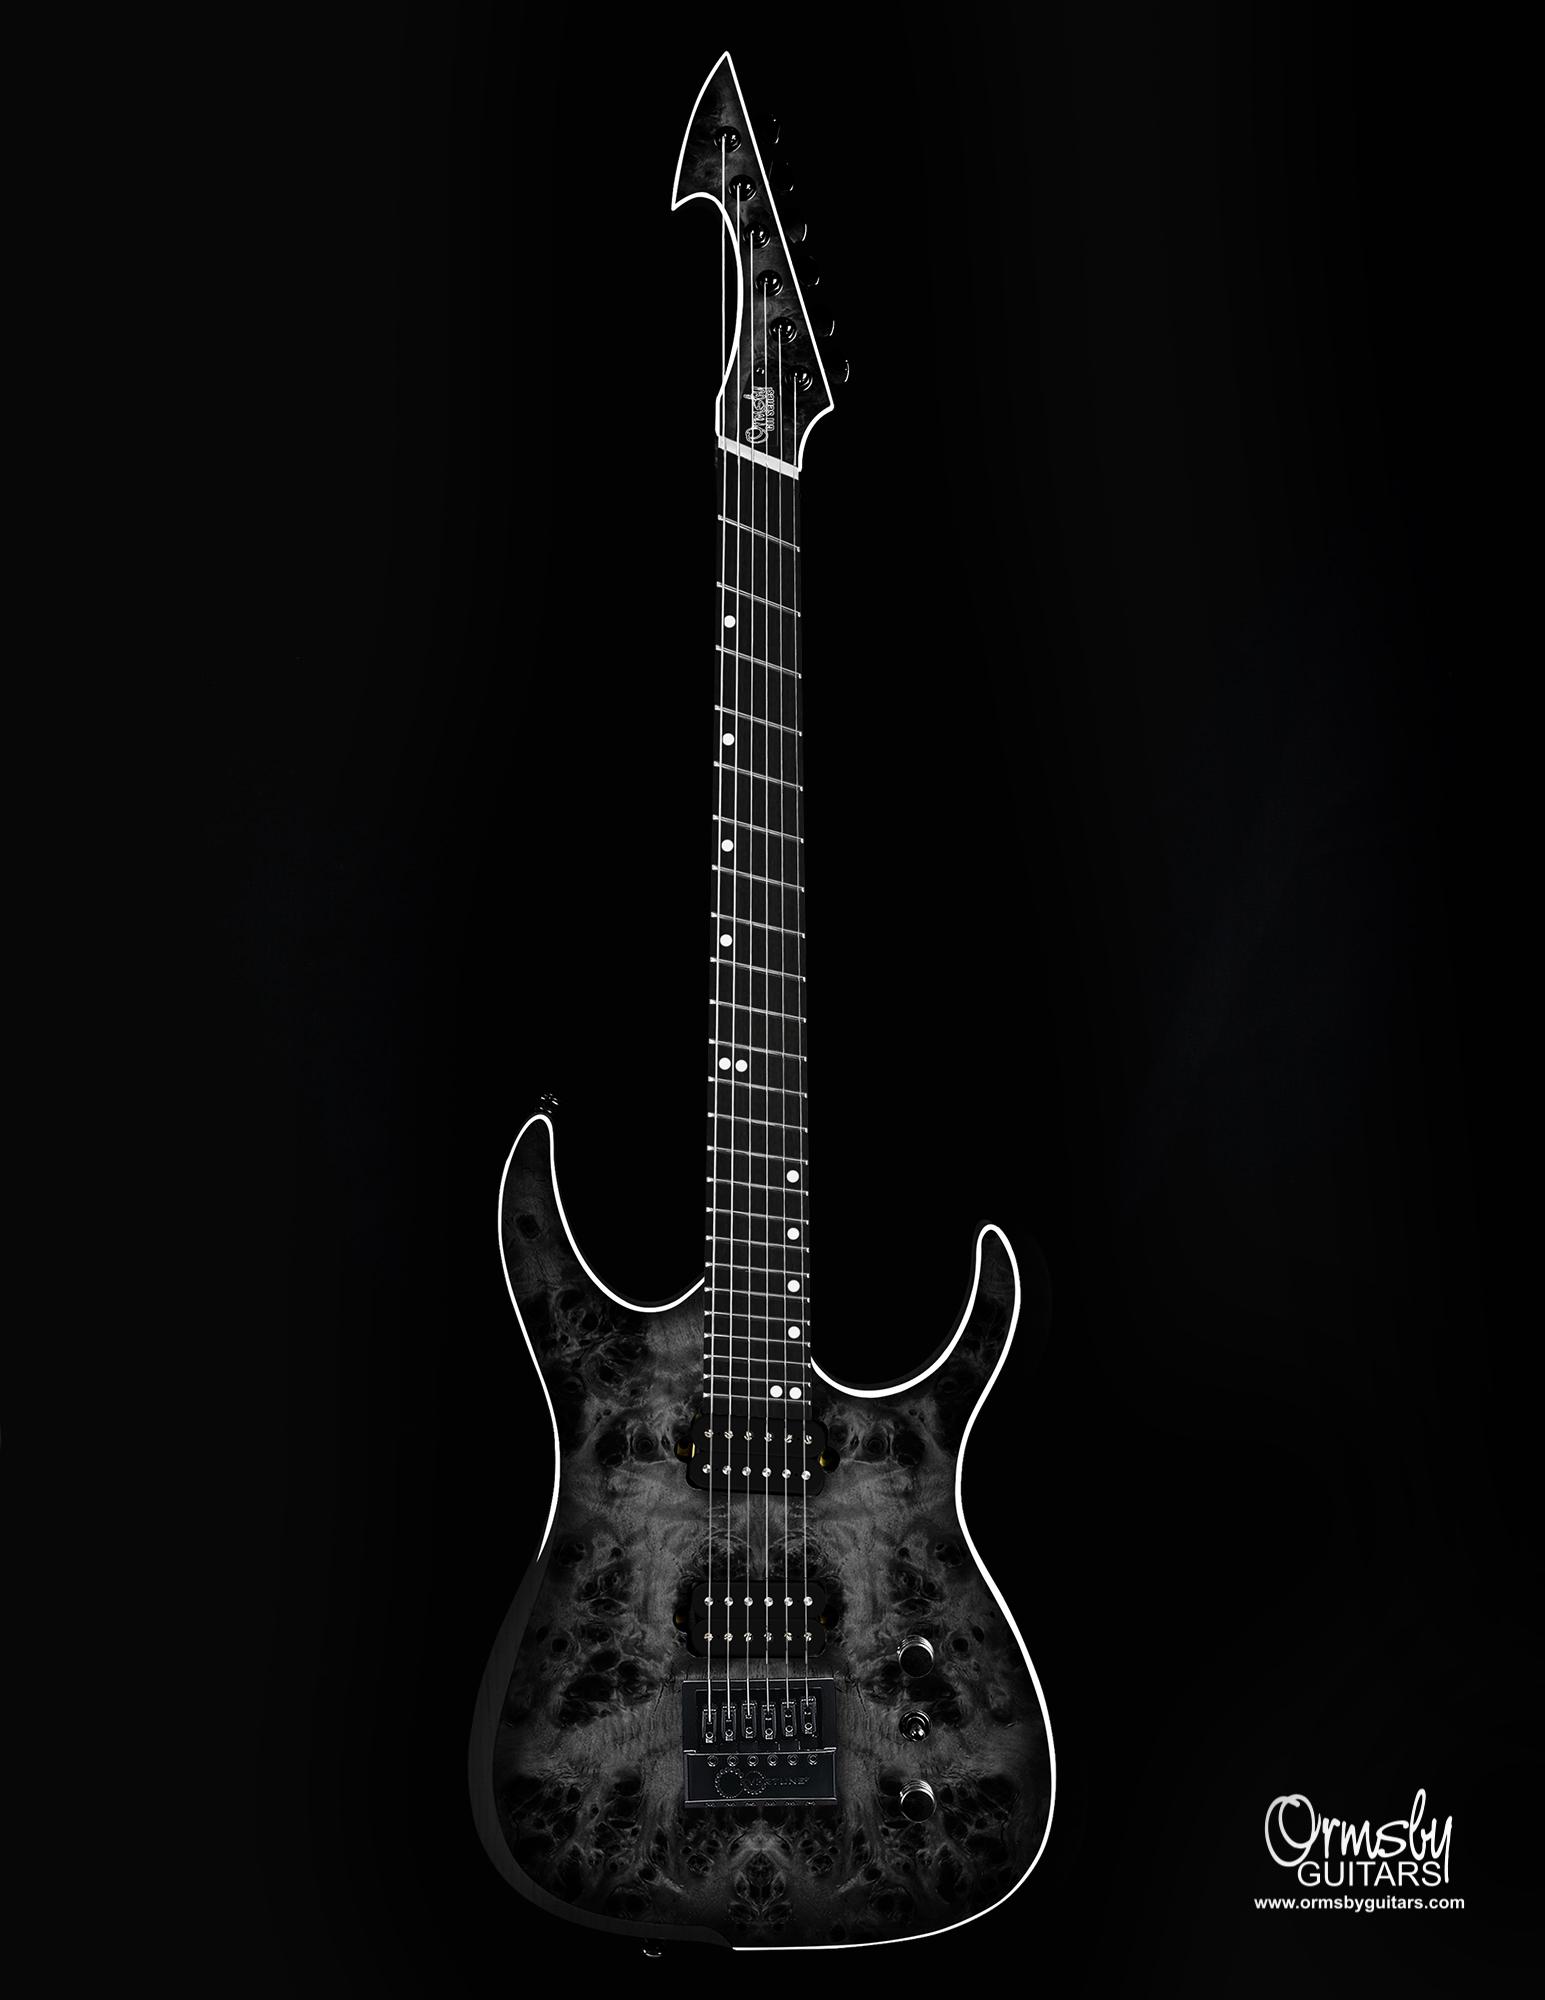 Ormsby Guitars GTI Hype Poplar Exotic